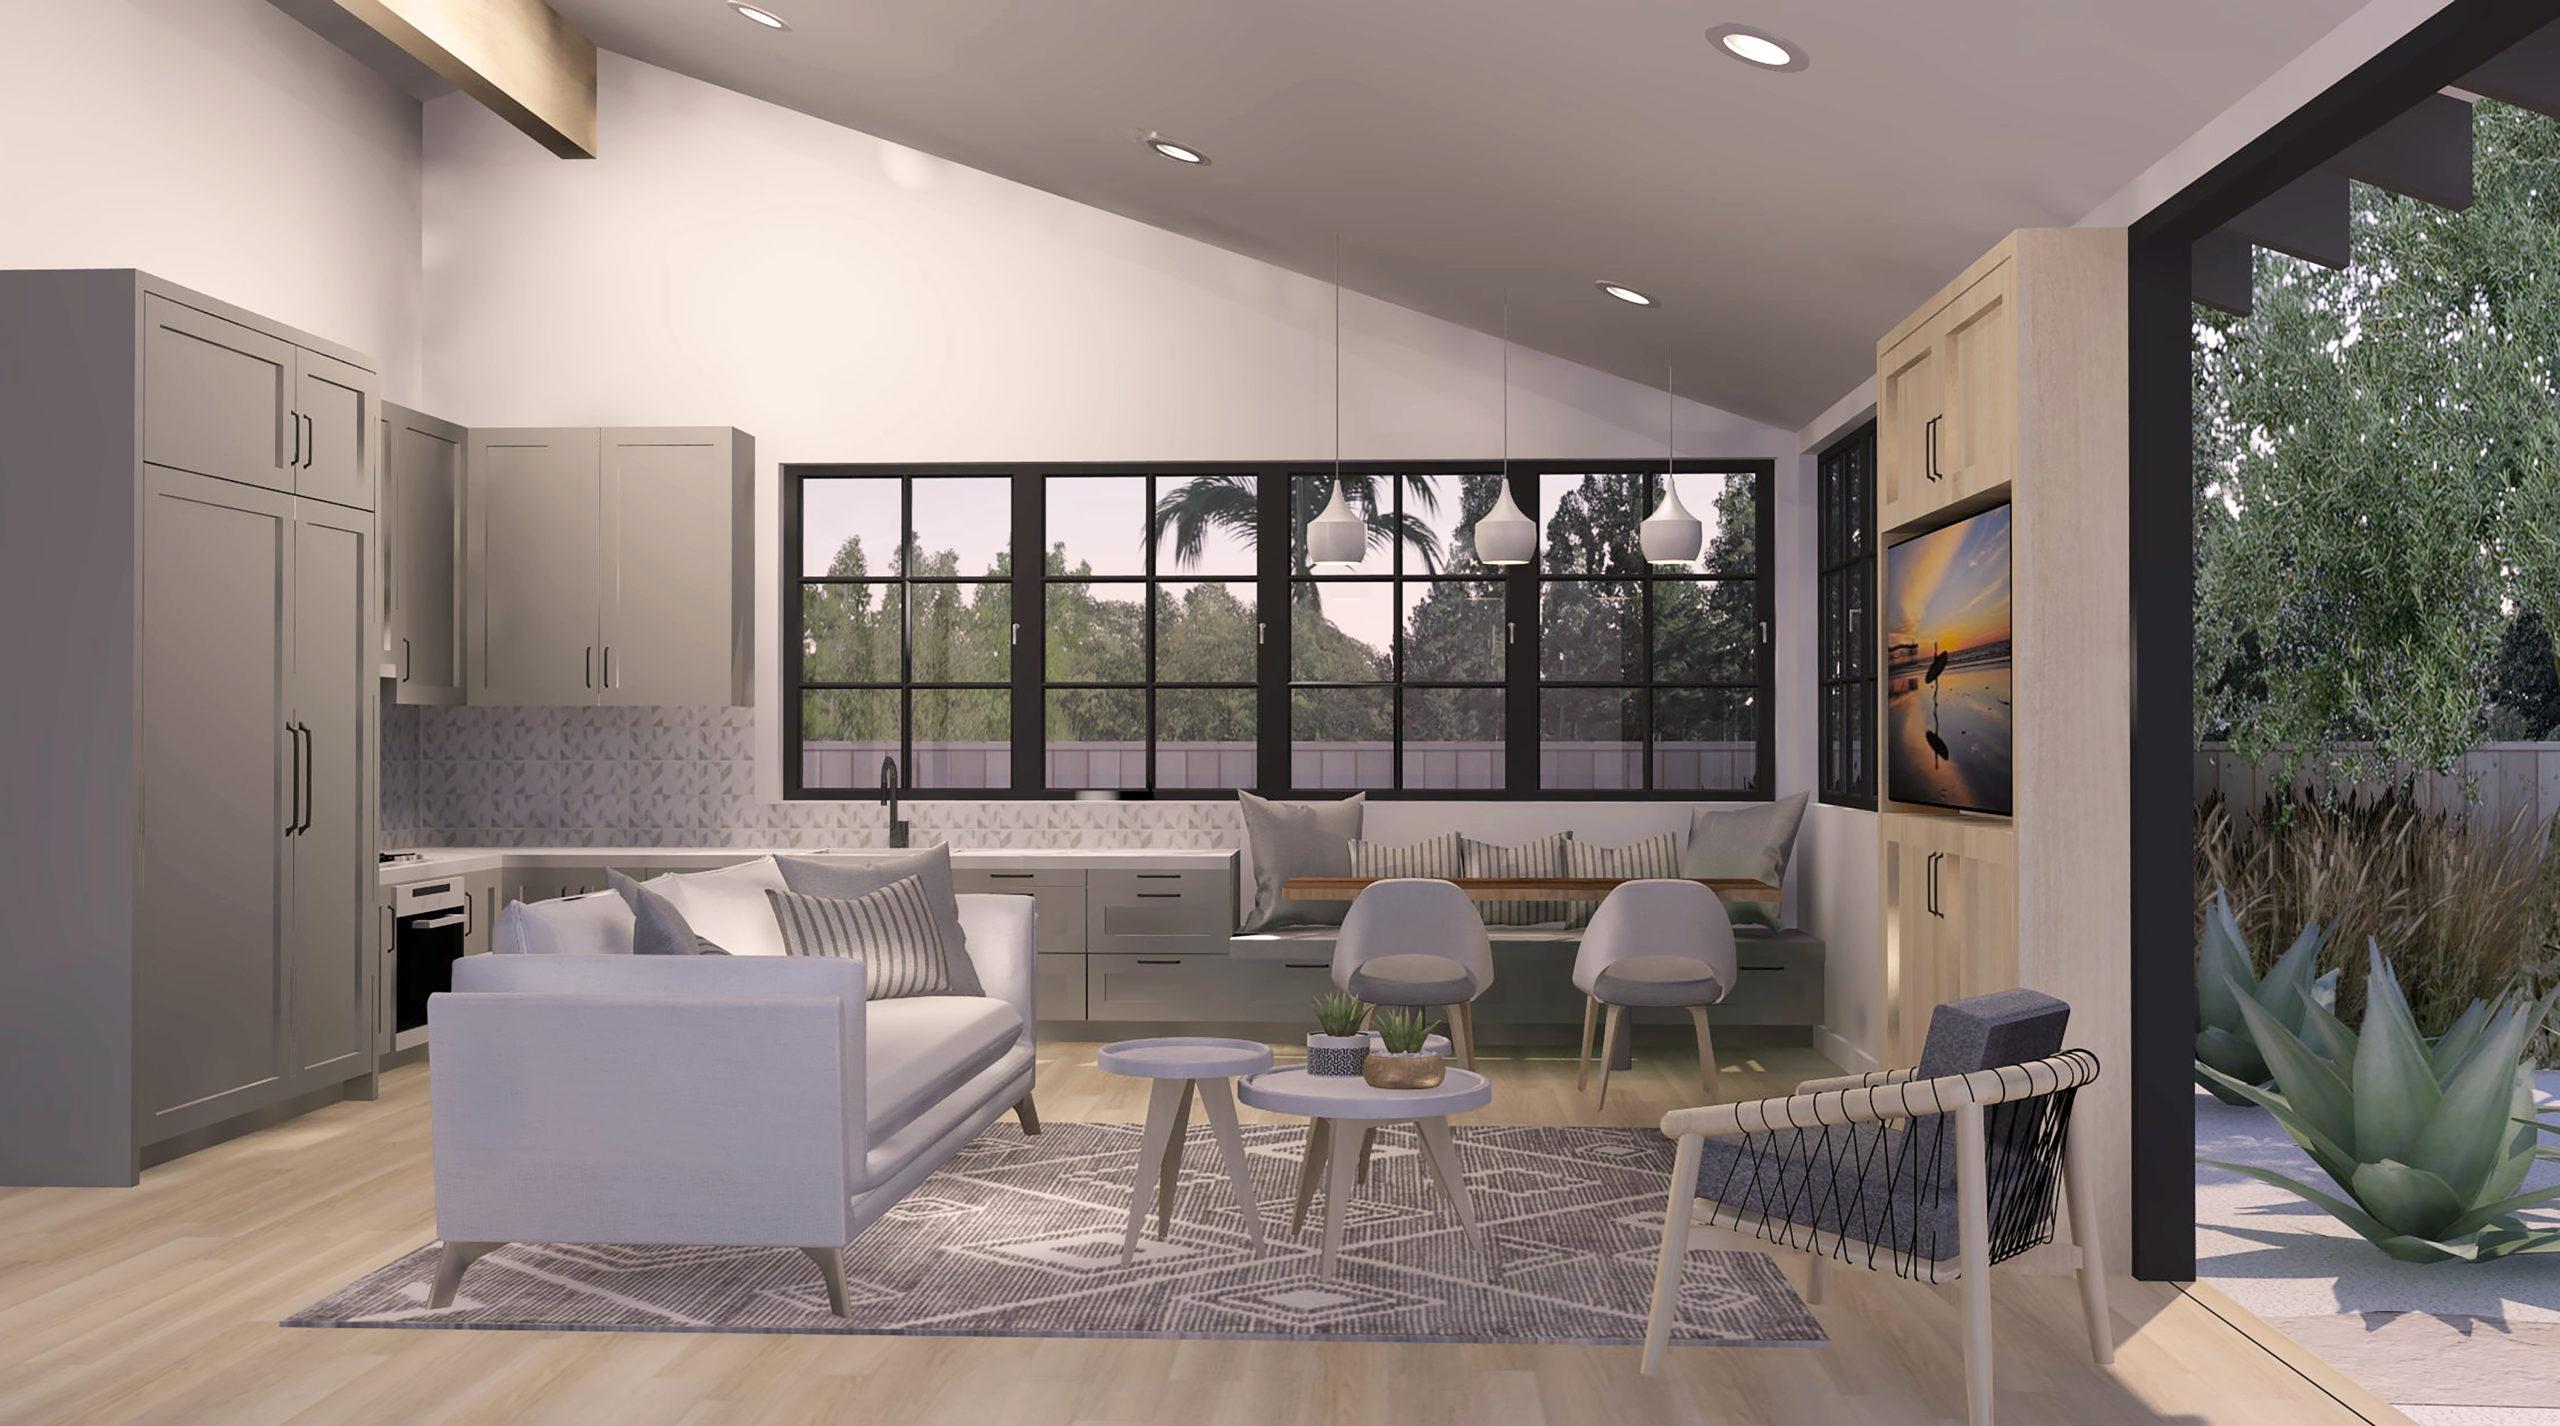 Cross Ready-to-Build_2bd-1ba_749 SF ADU kitchen rendering